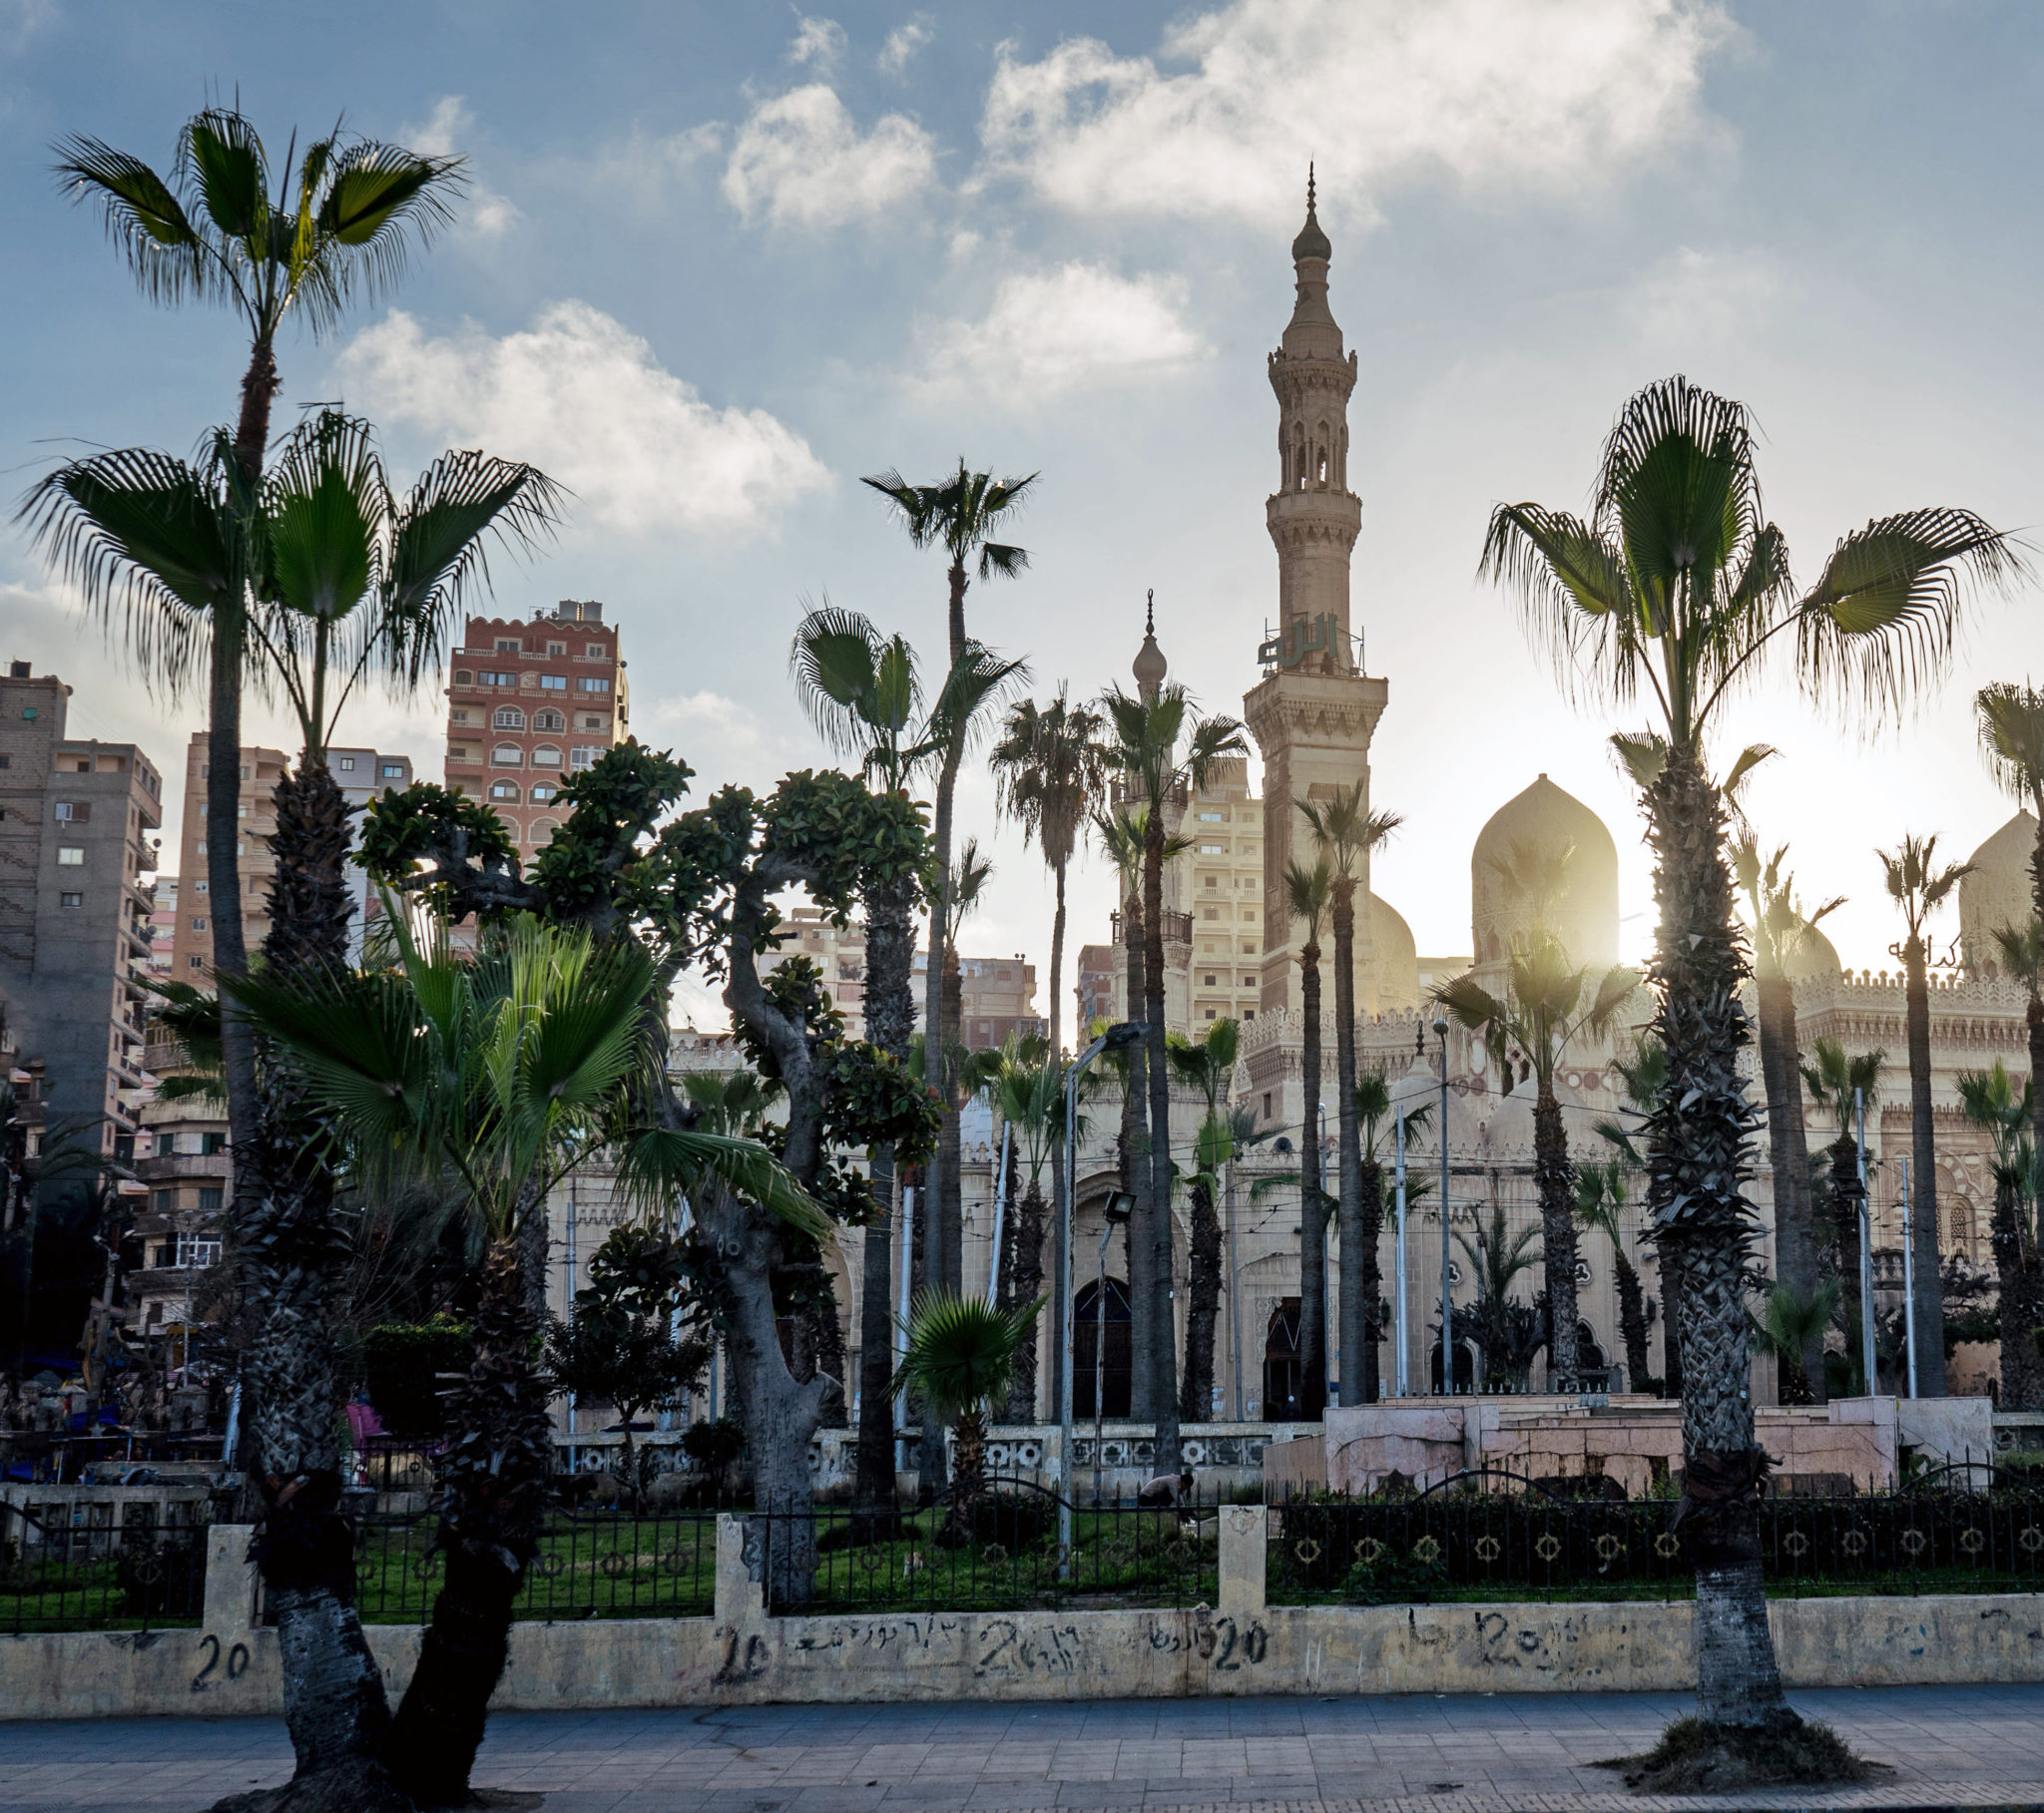 La moschea El-Mursi Abul-Abbas